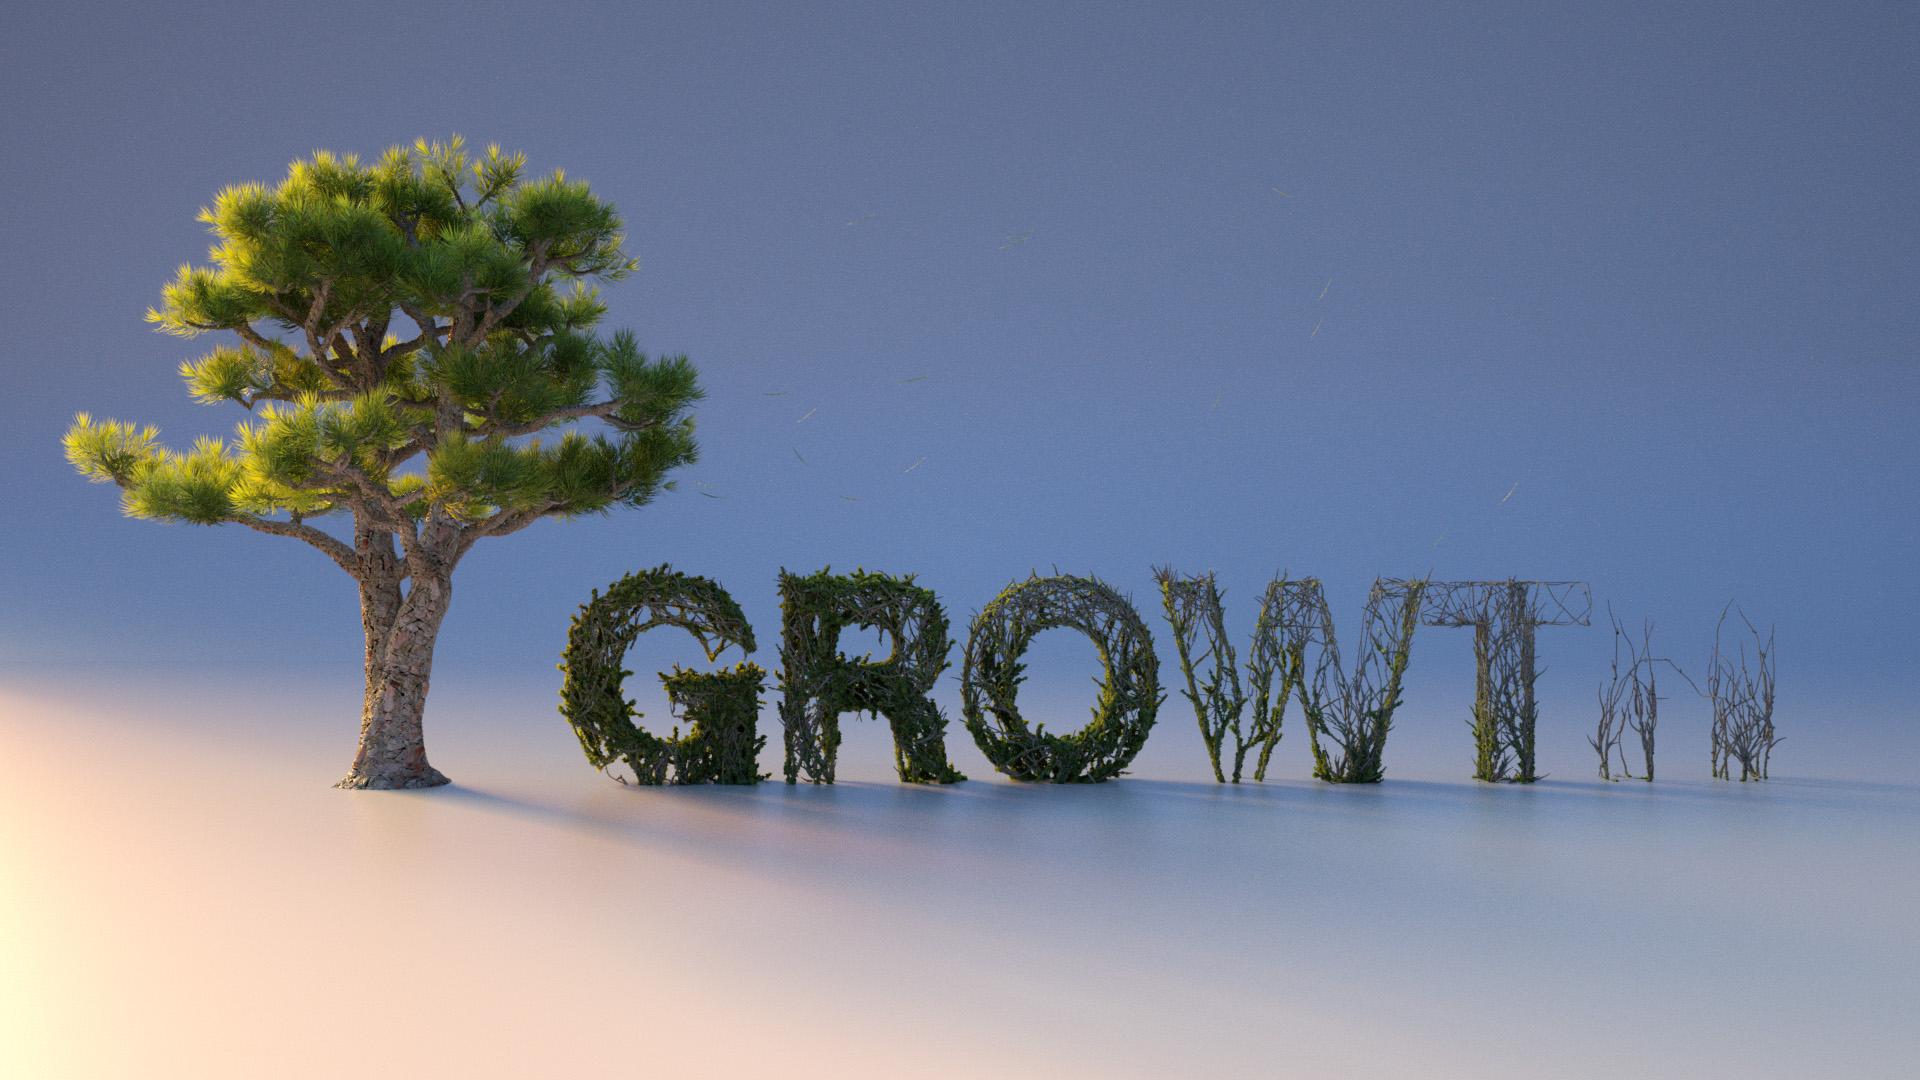 scene01_growth_closeup02 (0-00-06-01).jpg